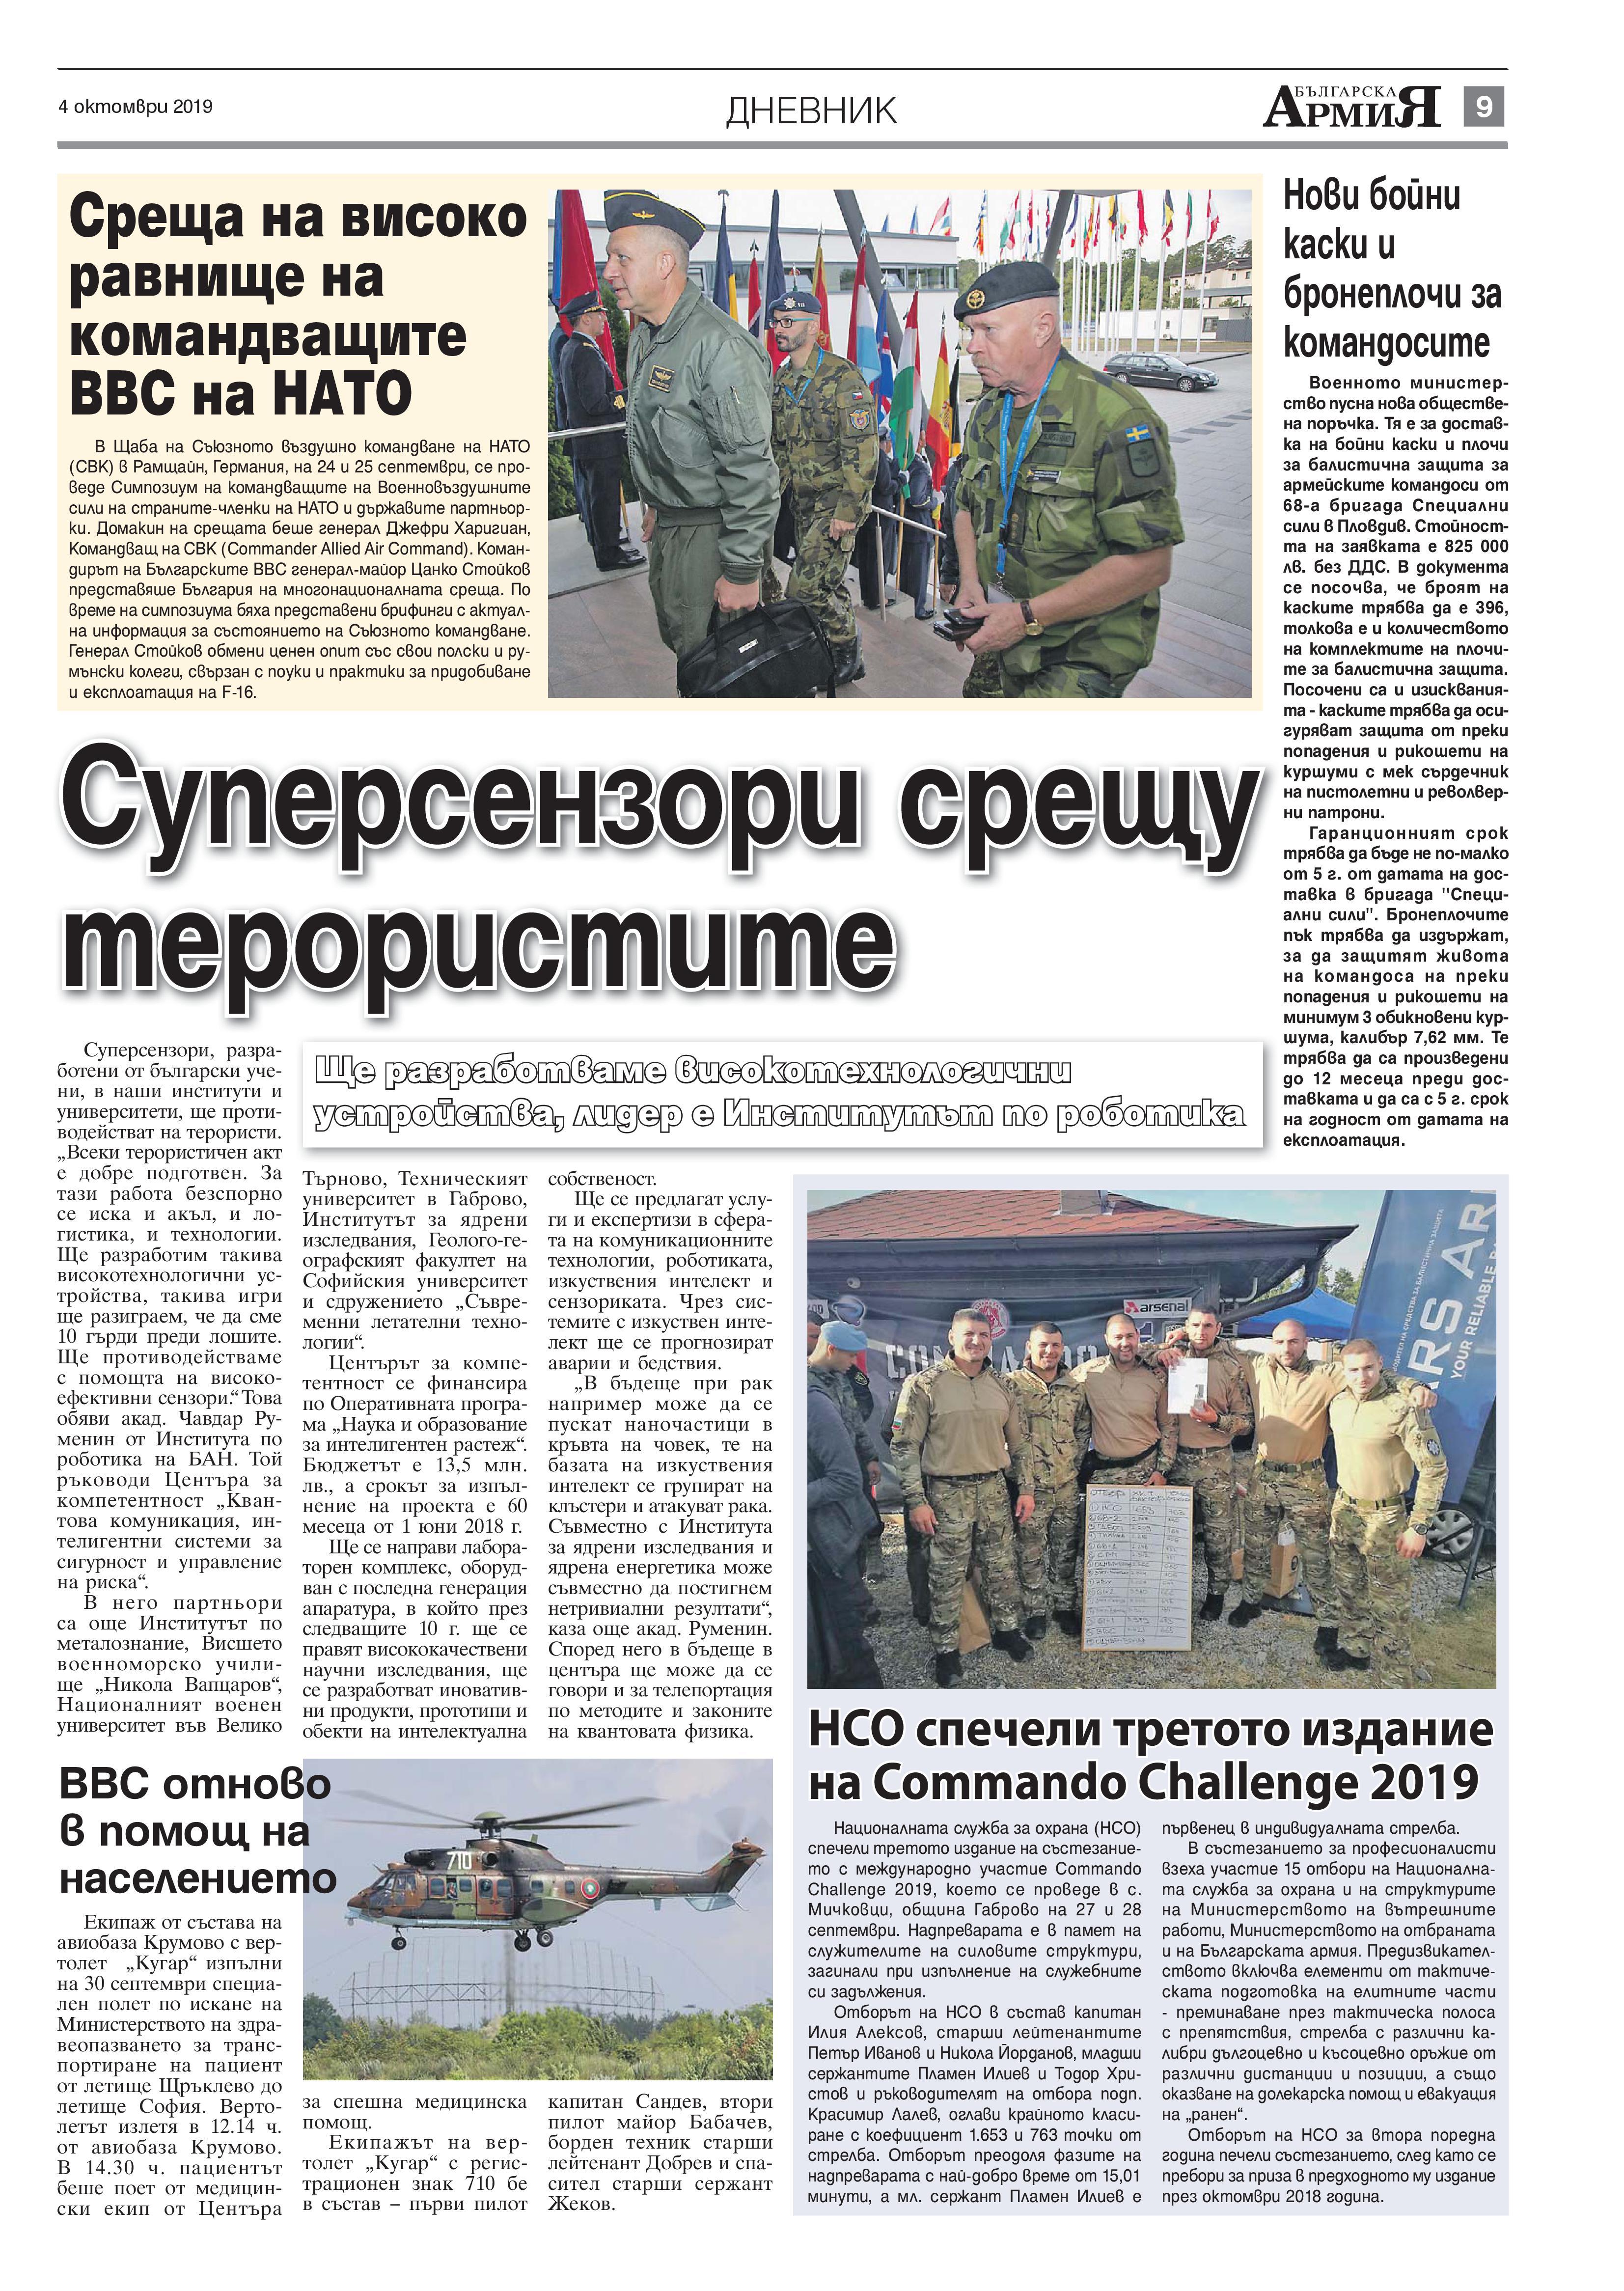 https://armymedia.bg/wp-content/uploads/2015/06/09-32.jpg